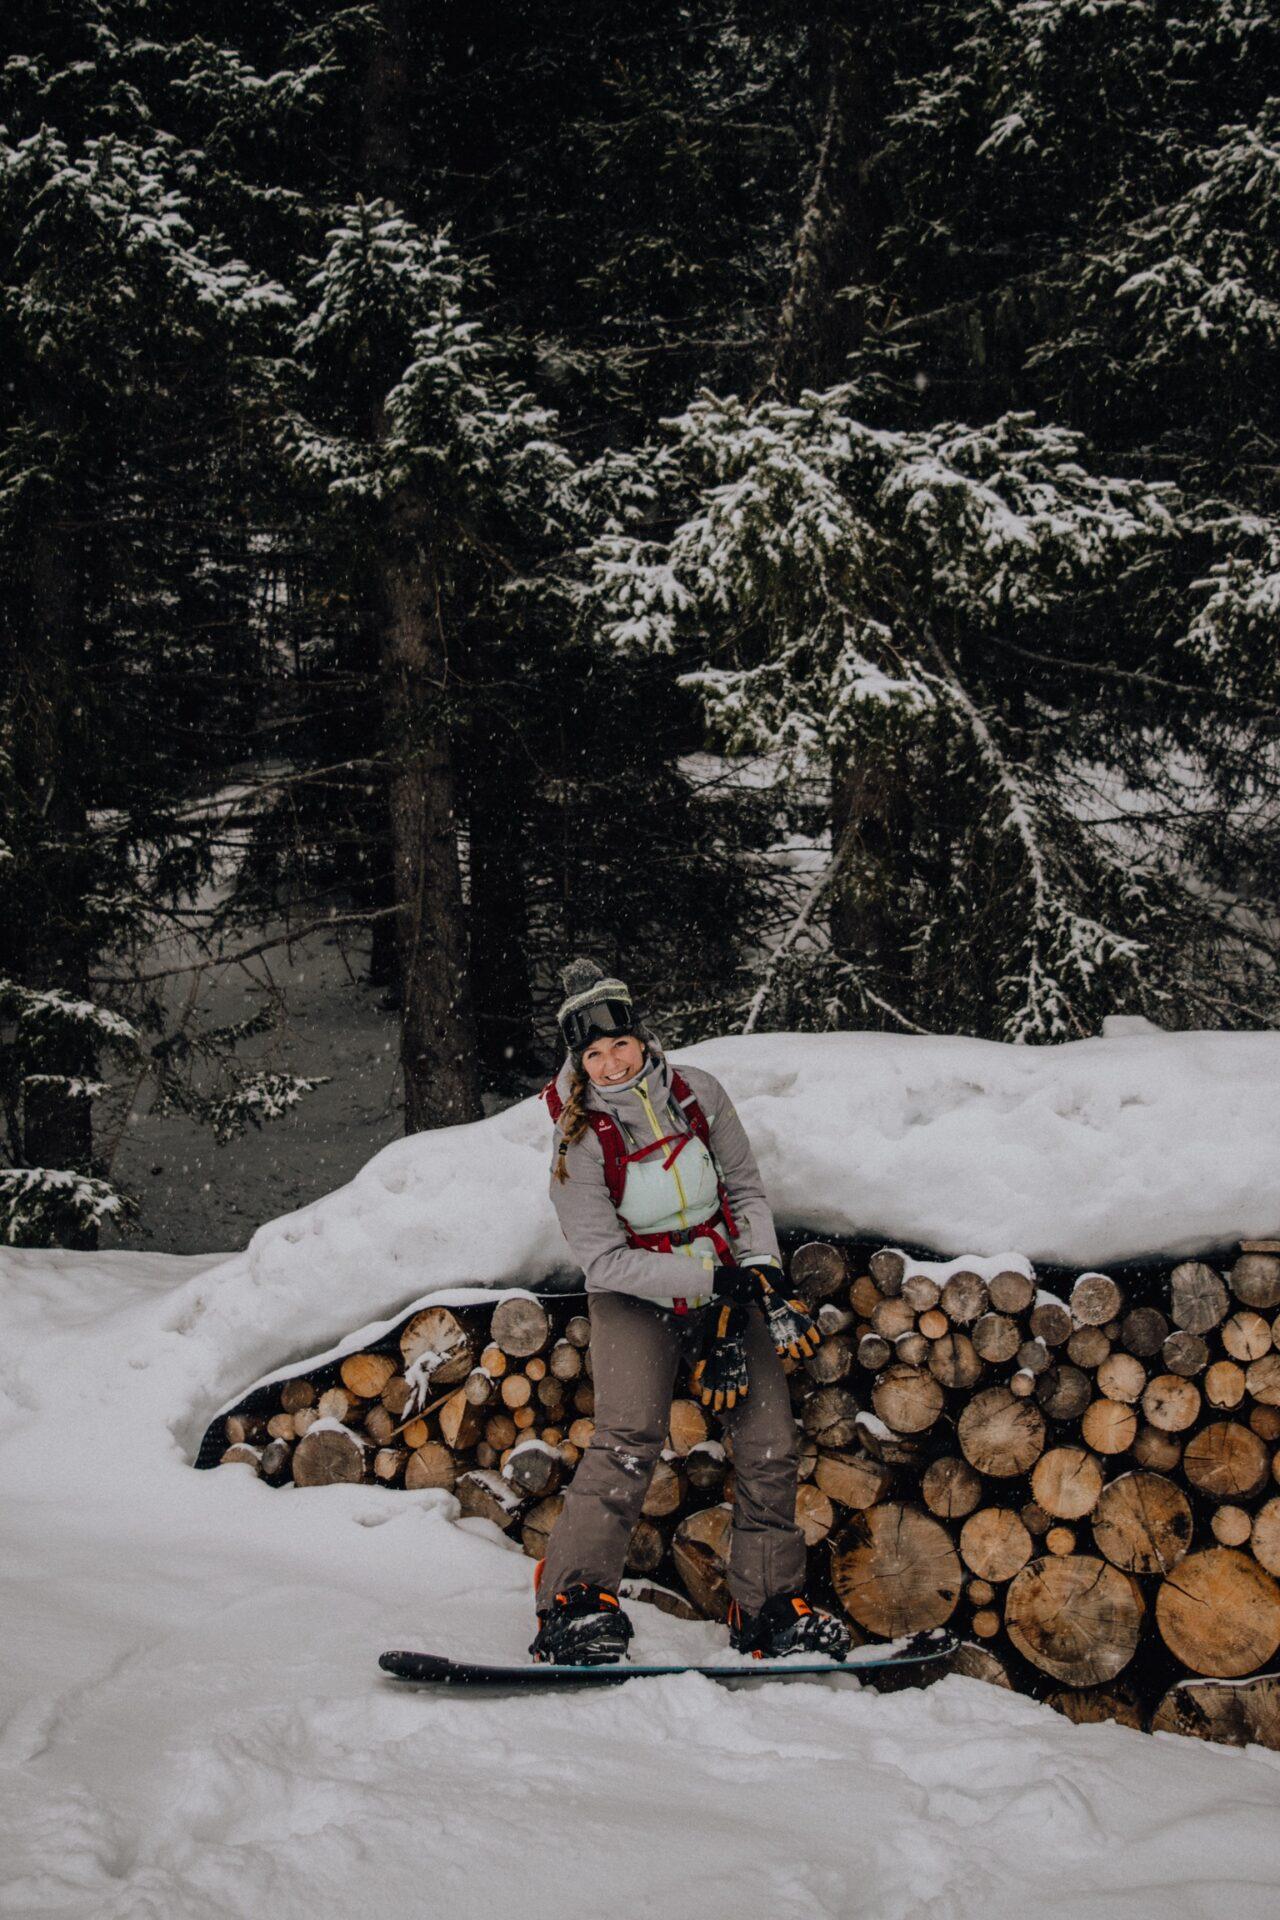 TravelRebel gastblogger Silke snowboarden in Italië - Dolomieten